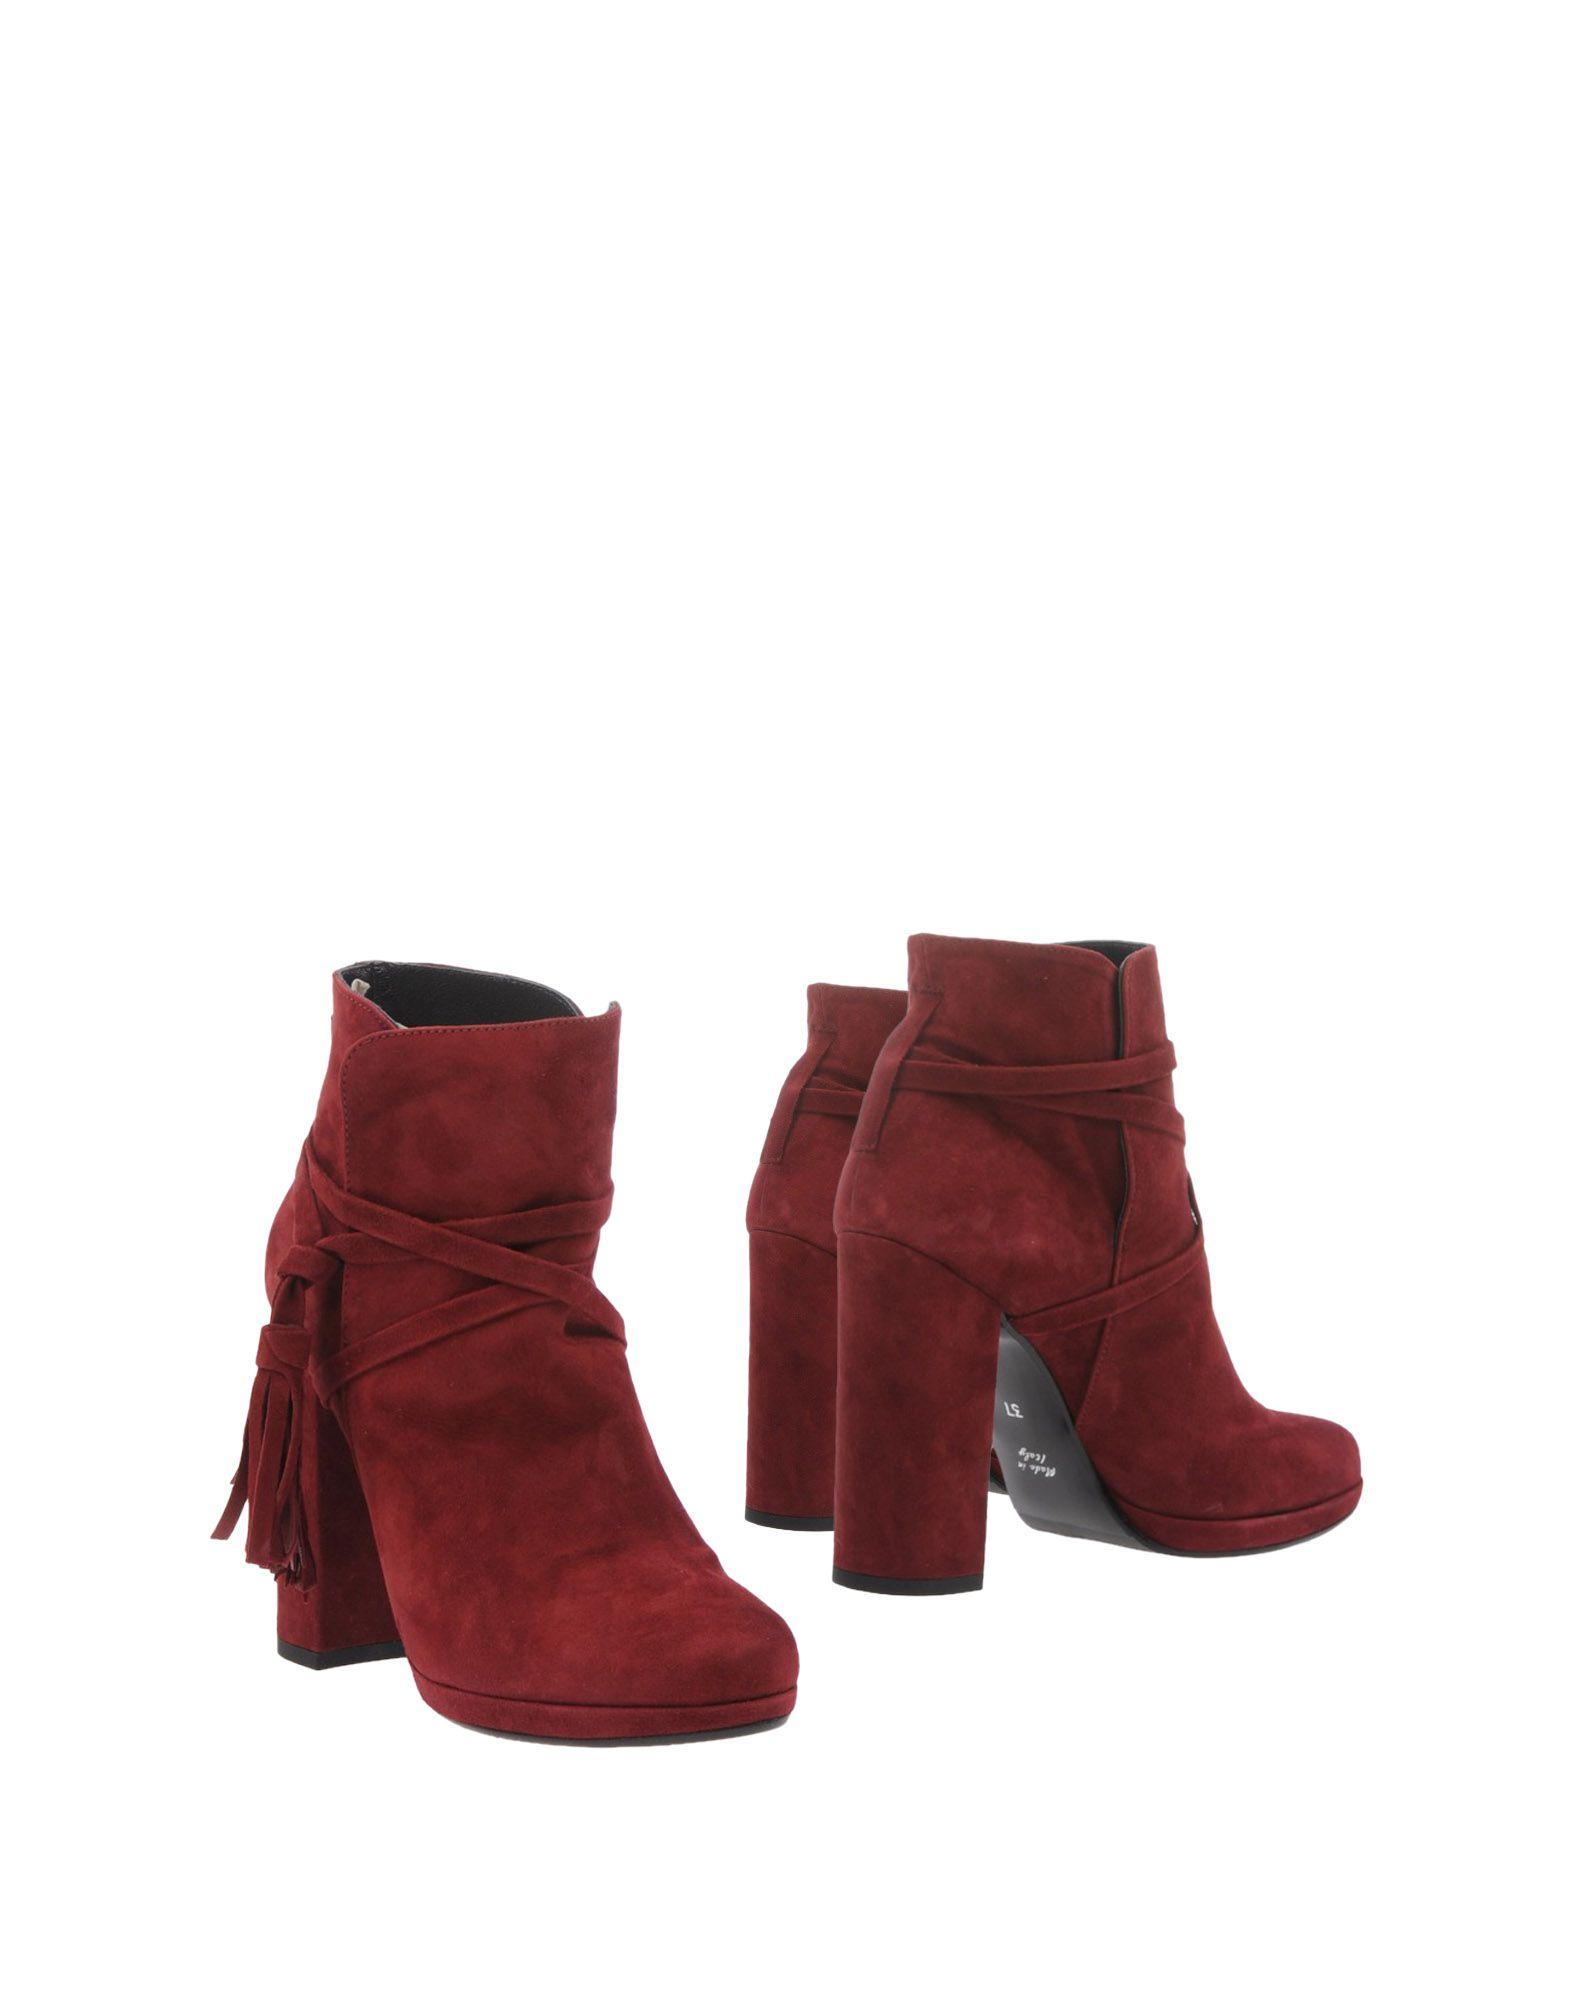 Moda Stivaletti Spaziomoda Donna - 11222514RV